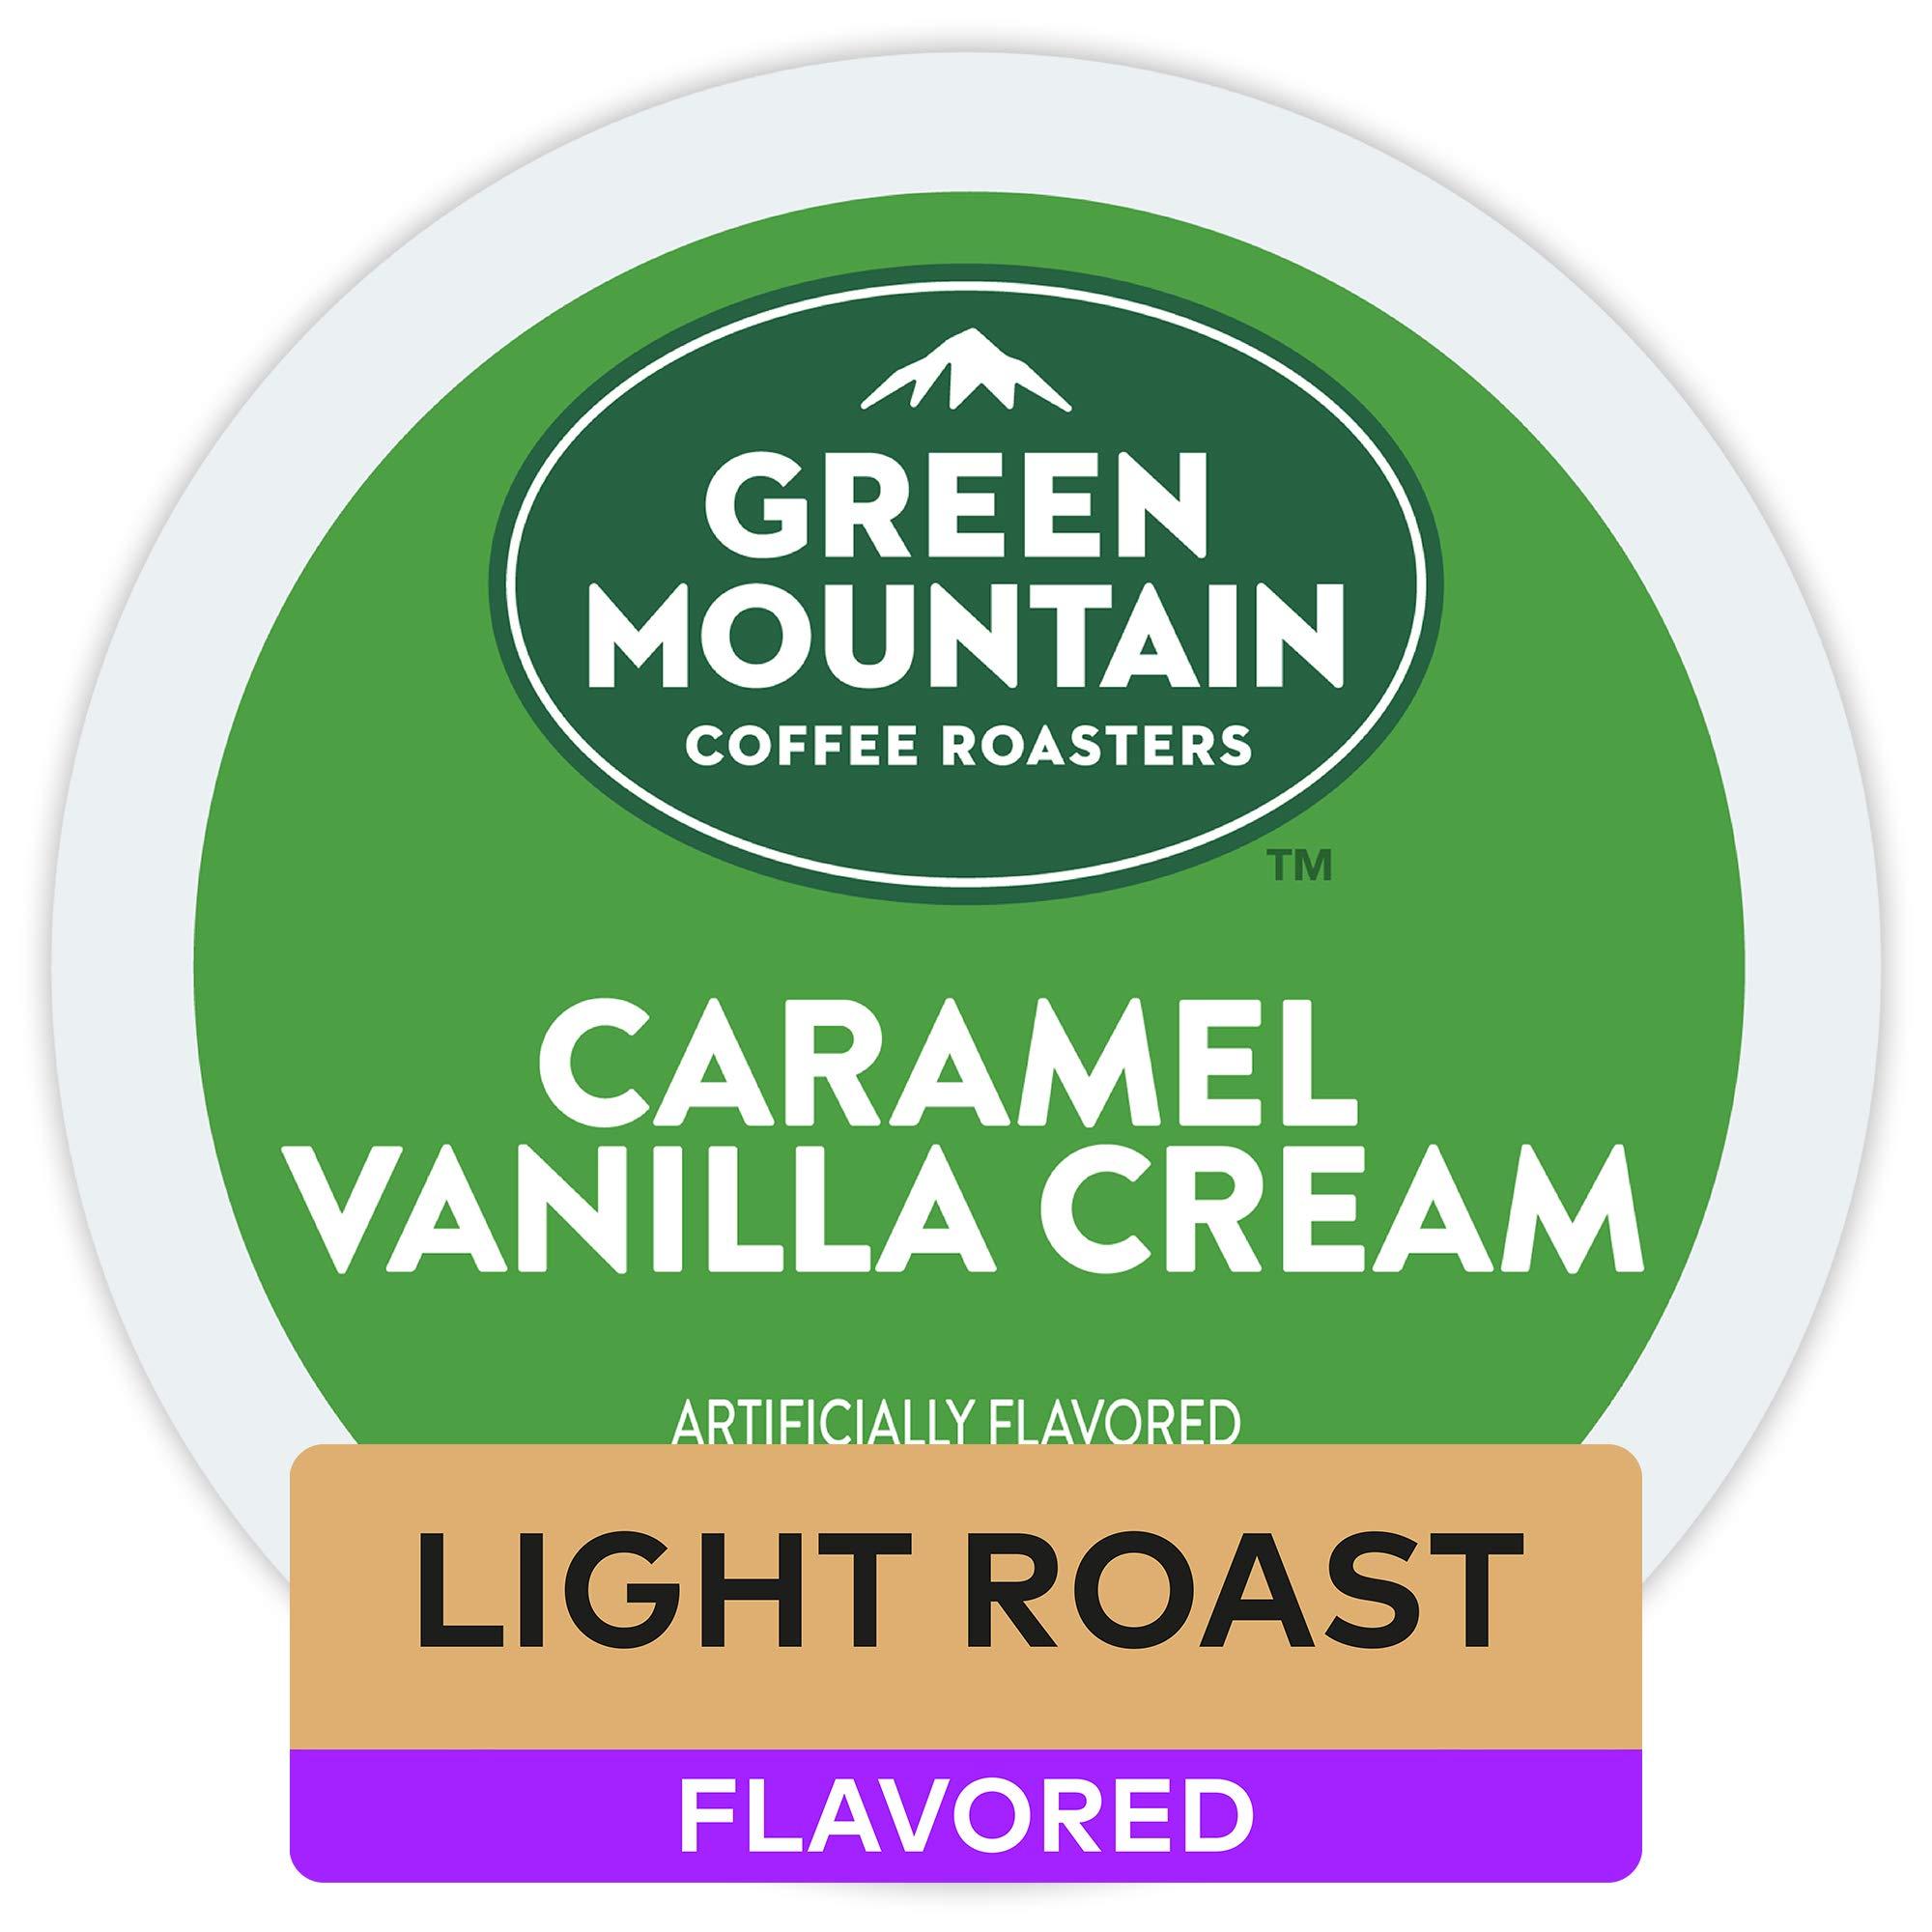 Green Mountain Coffee Roasters Caramel Vanilla Cream, Single Serve Coffee K-Cup Pod, Flavored Coffee, 32